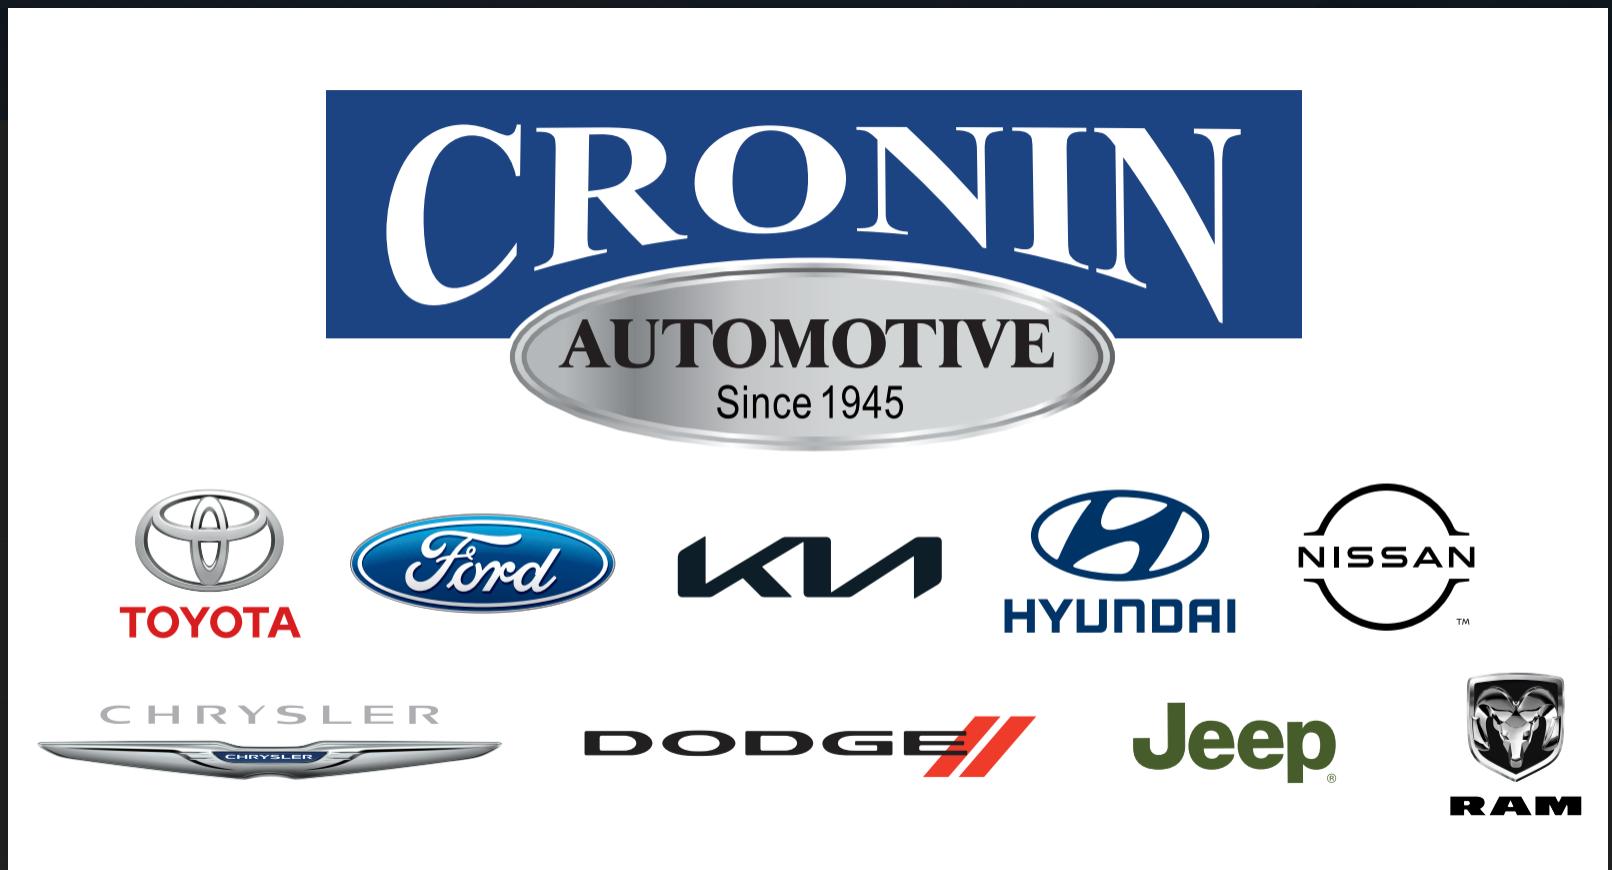 Cronin Automotive